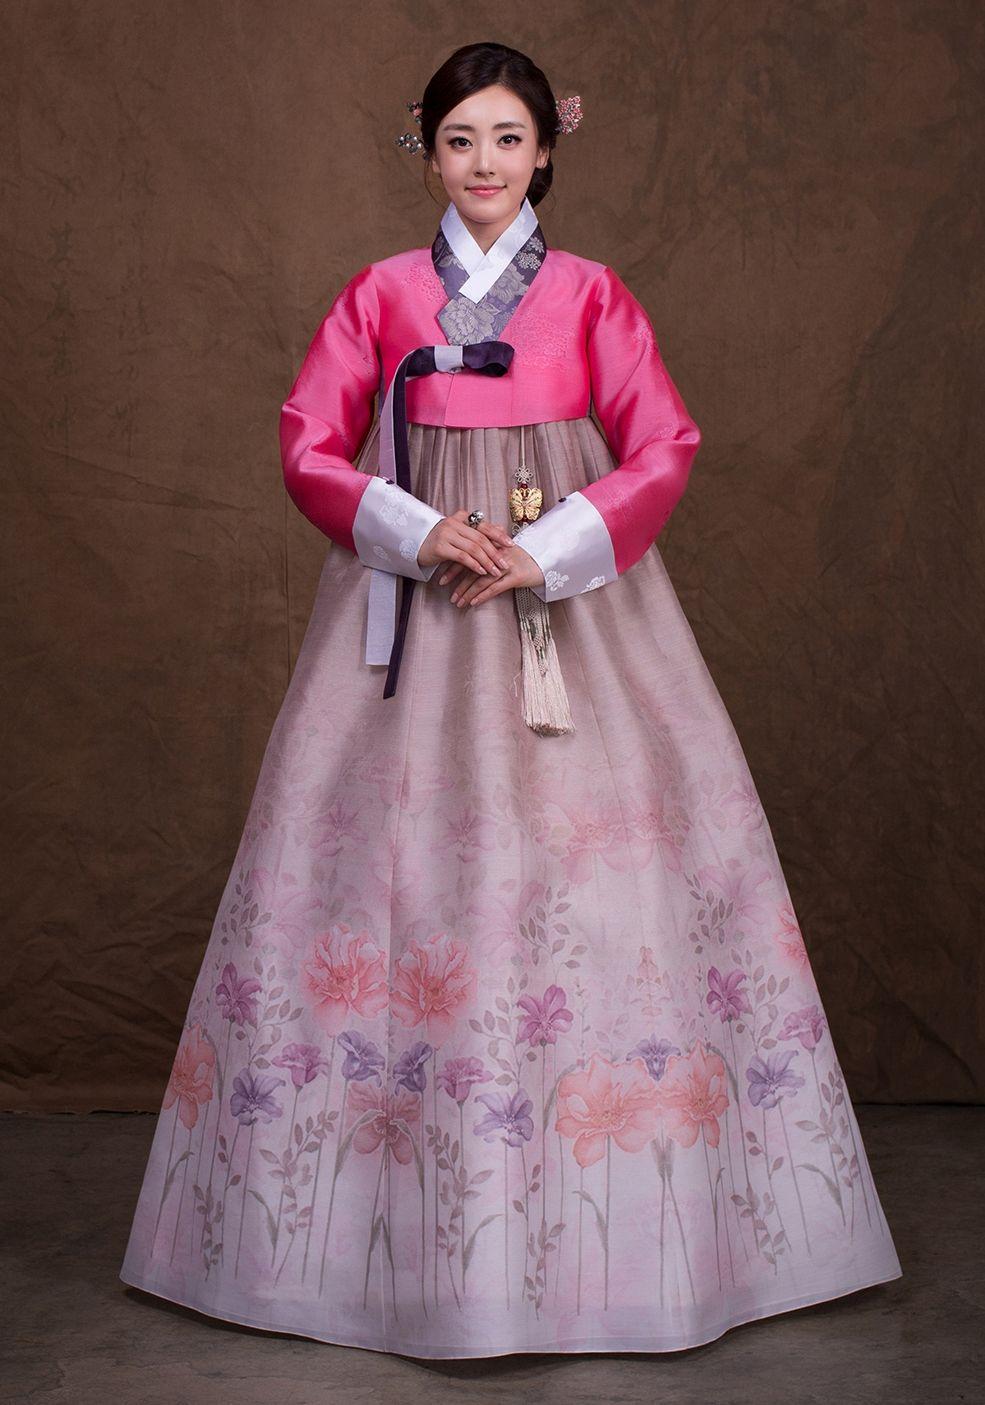 Korean Traditional Dress in 2019 Hanbok wedding, Korean